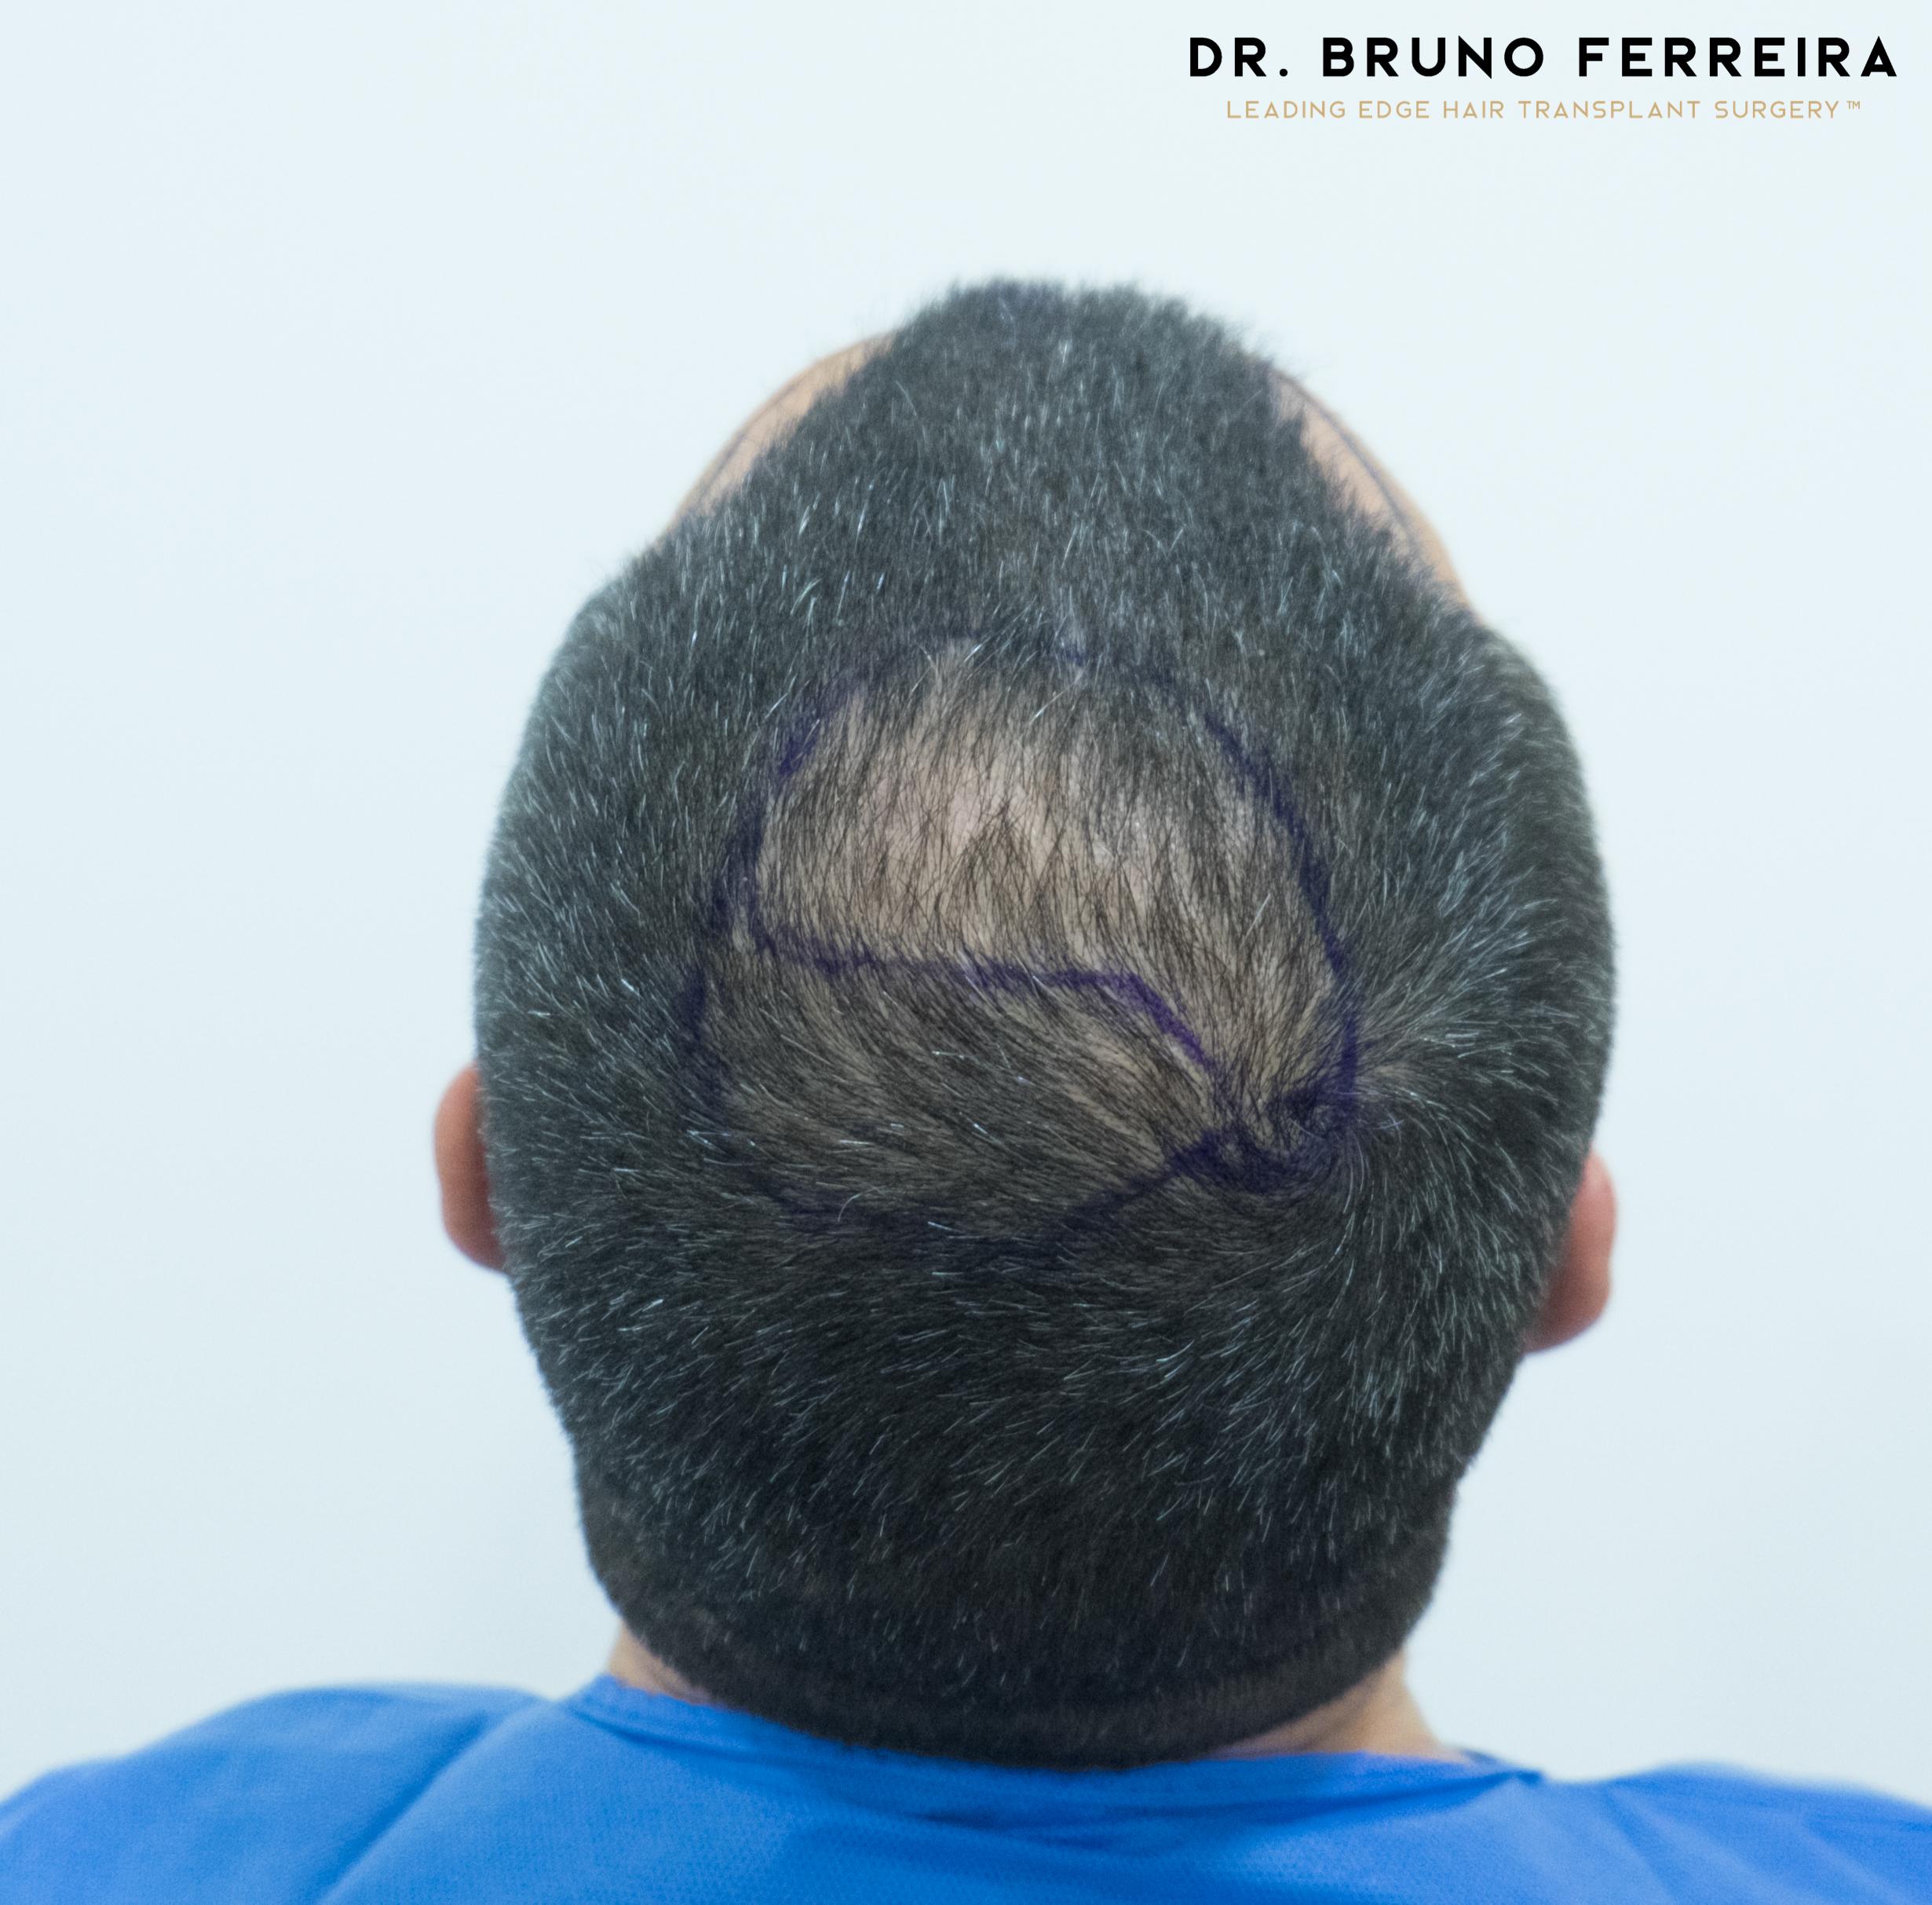 00002 DR. BRUNO FERREIRA (Case 1) - Before - 3.jpg